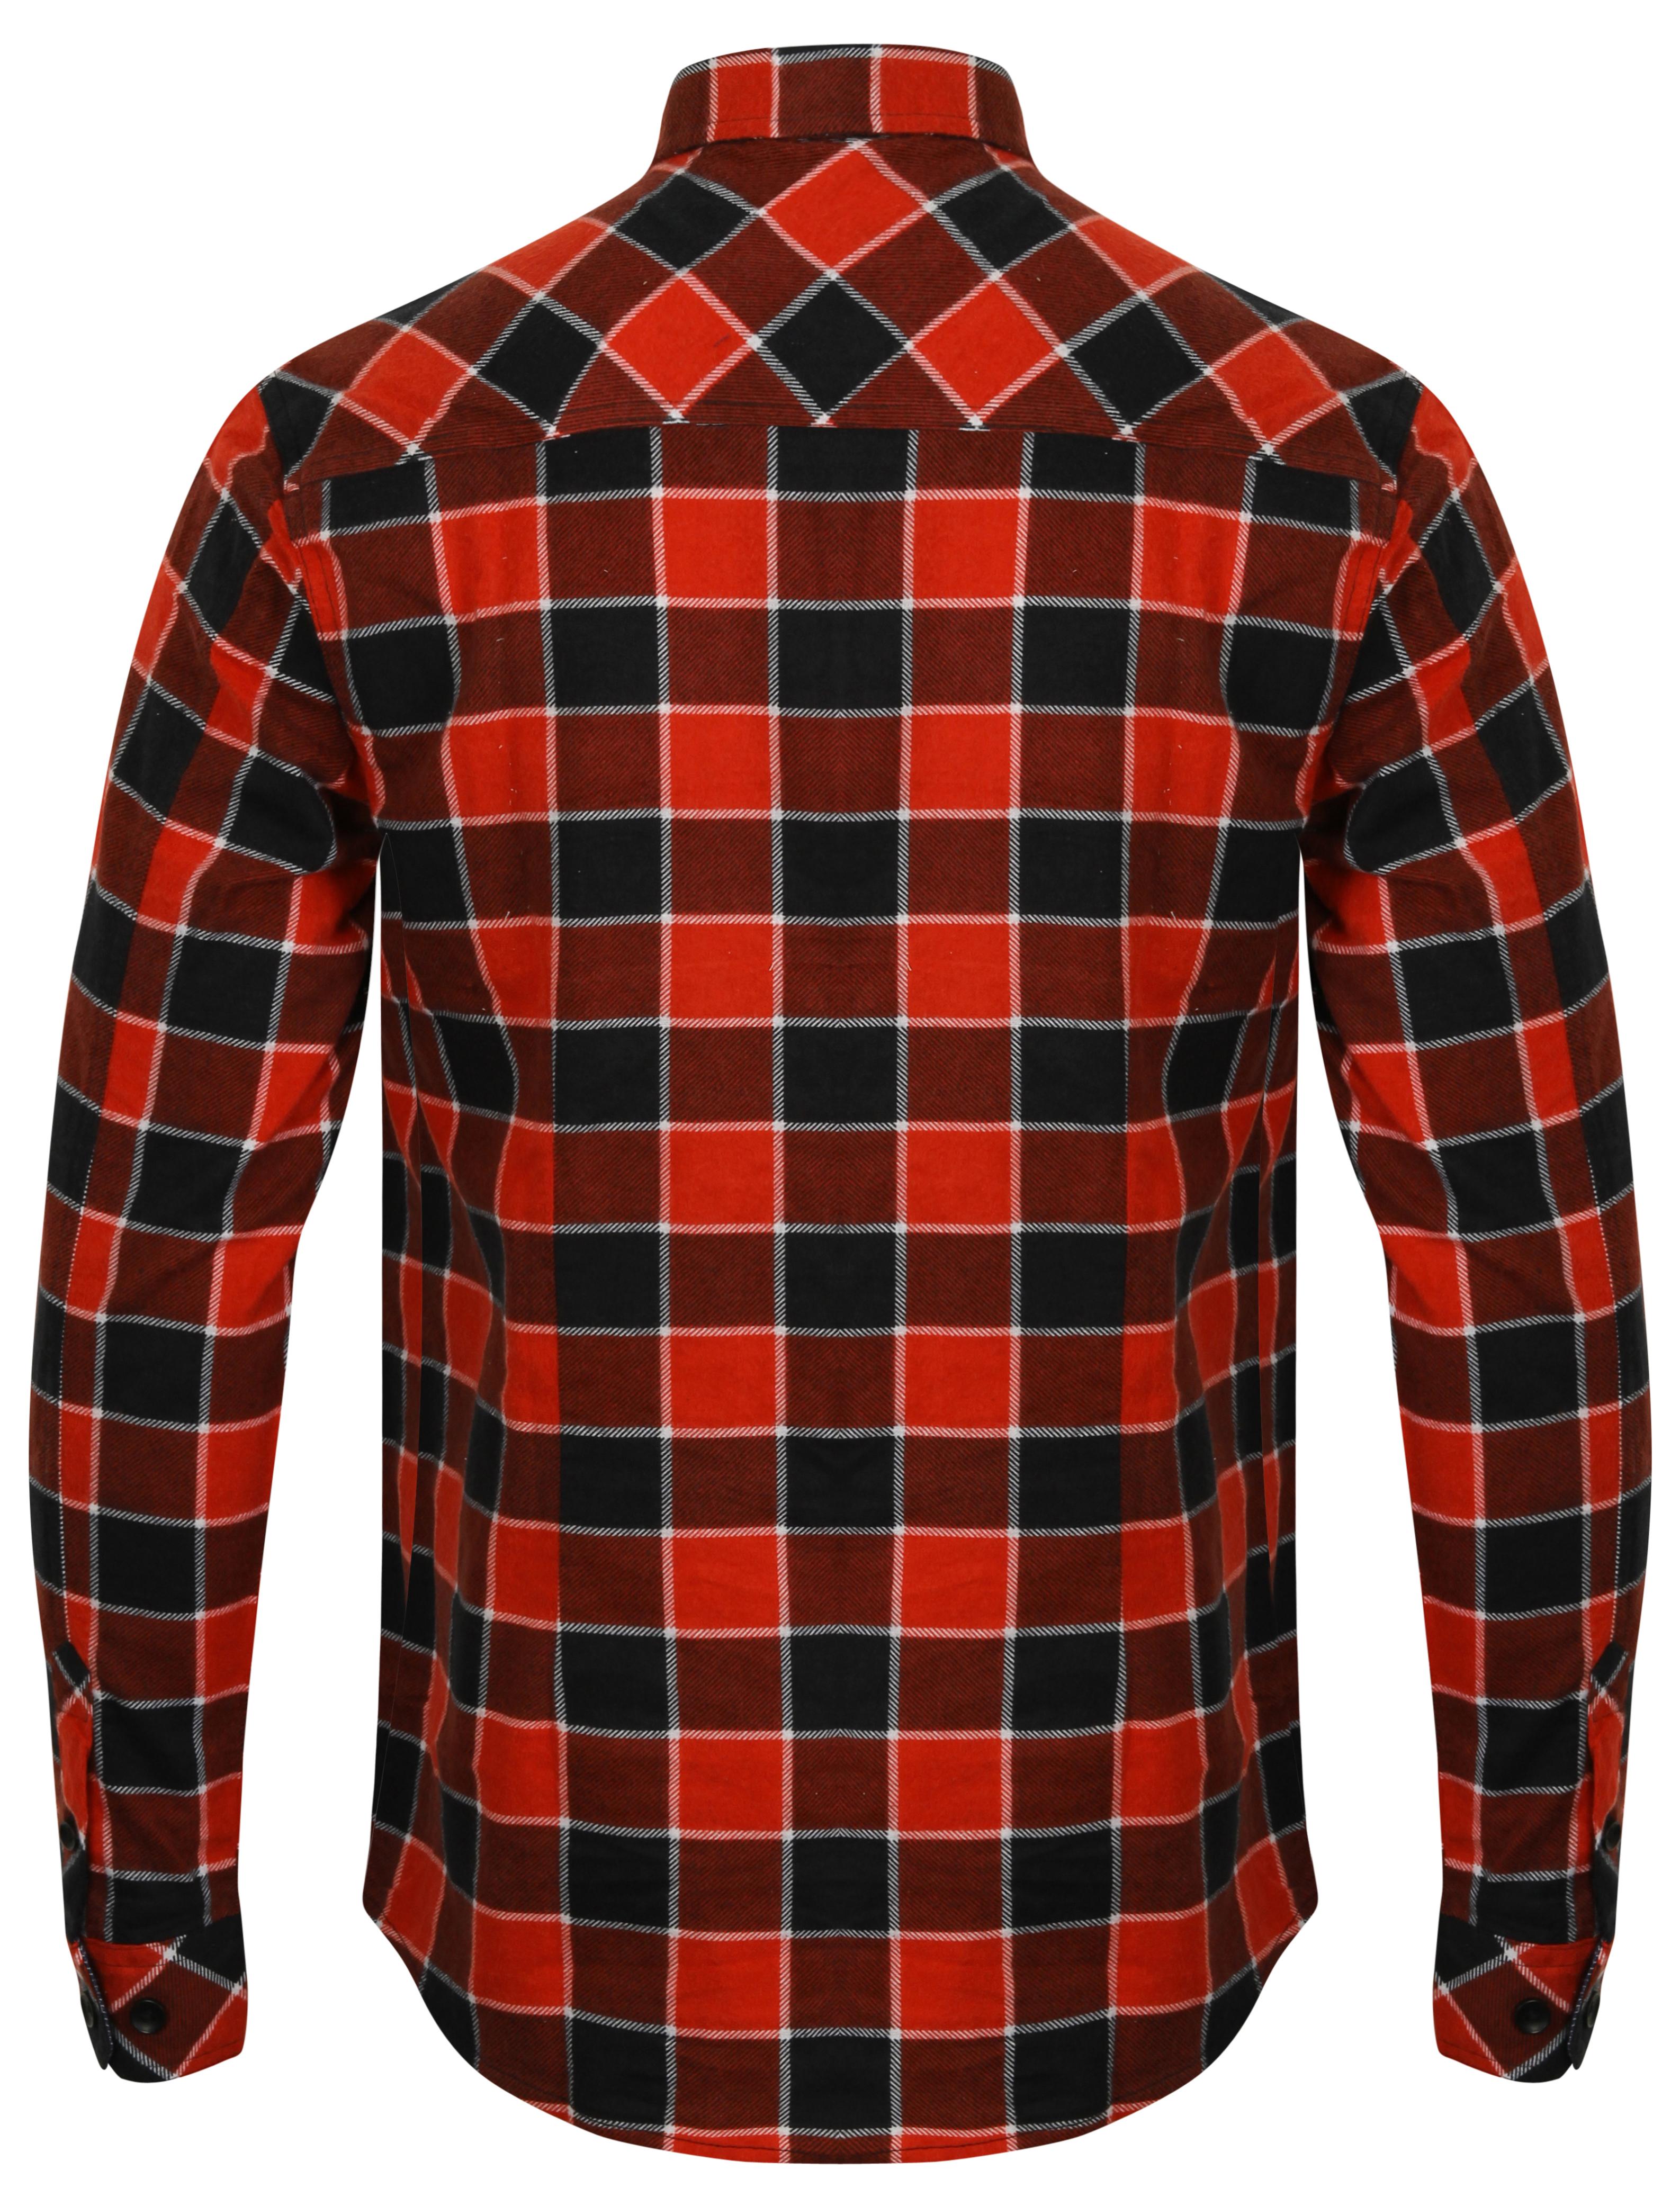 Mens-Shirt-Tokyo-Laundry-Tartan-Check-Flannel-Top-Collared-Long-Sleeved-Casual thumbnail 10